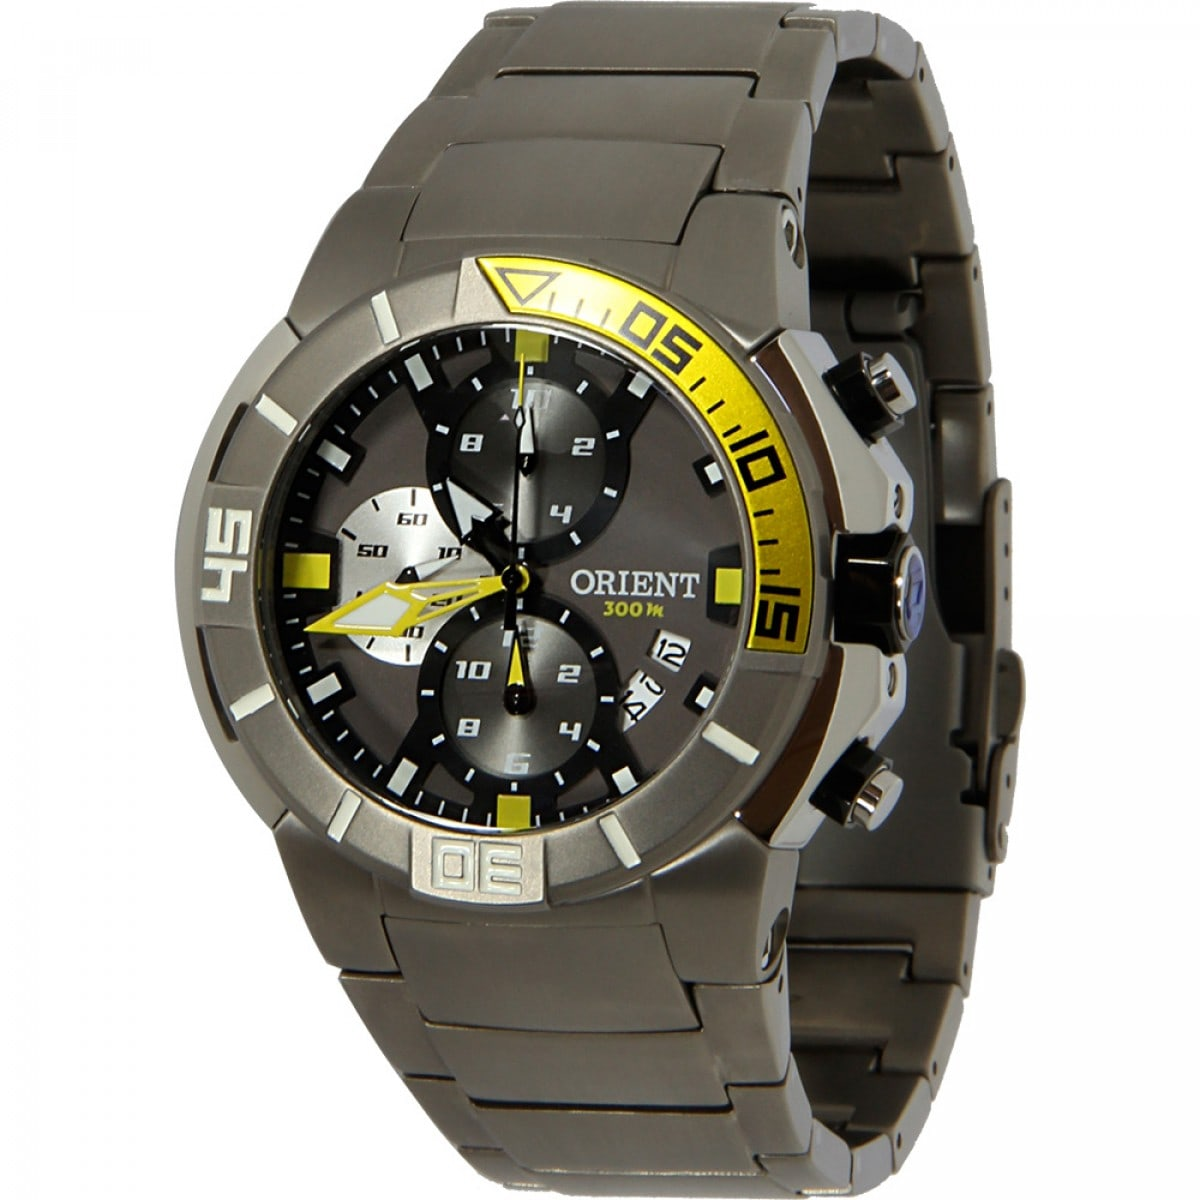 7ac887e2360 Relógio Sea Tech Titanium -Orient - Feira dos Importados de Brasília ...